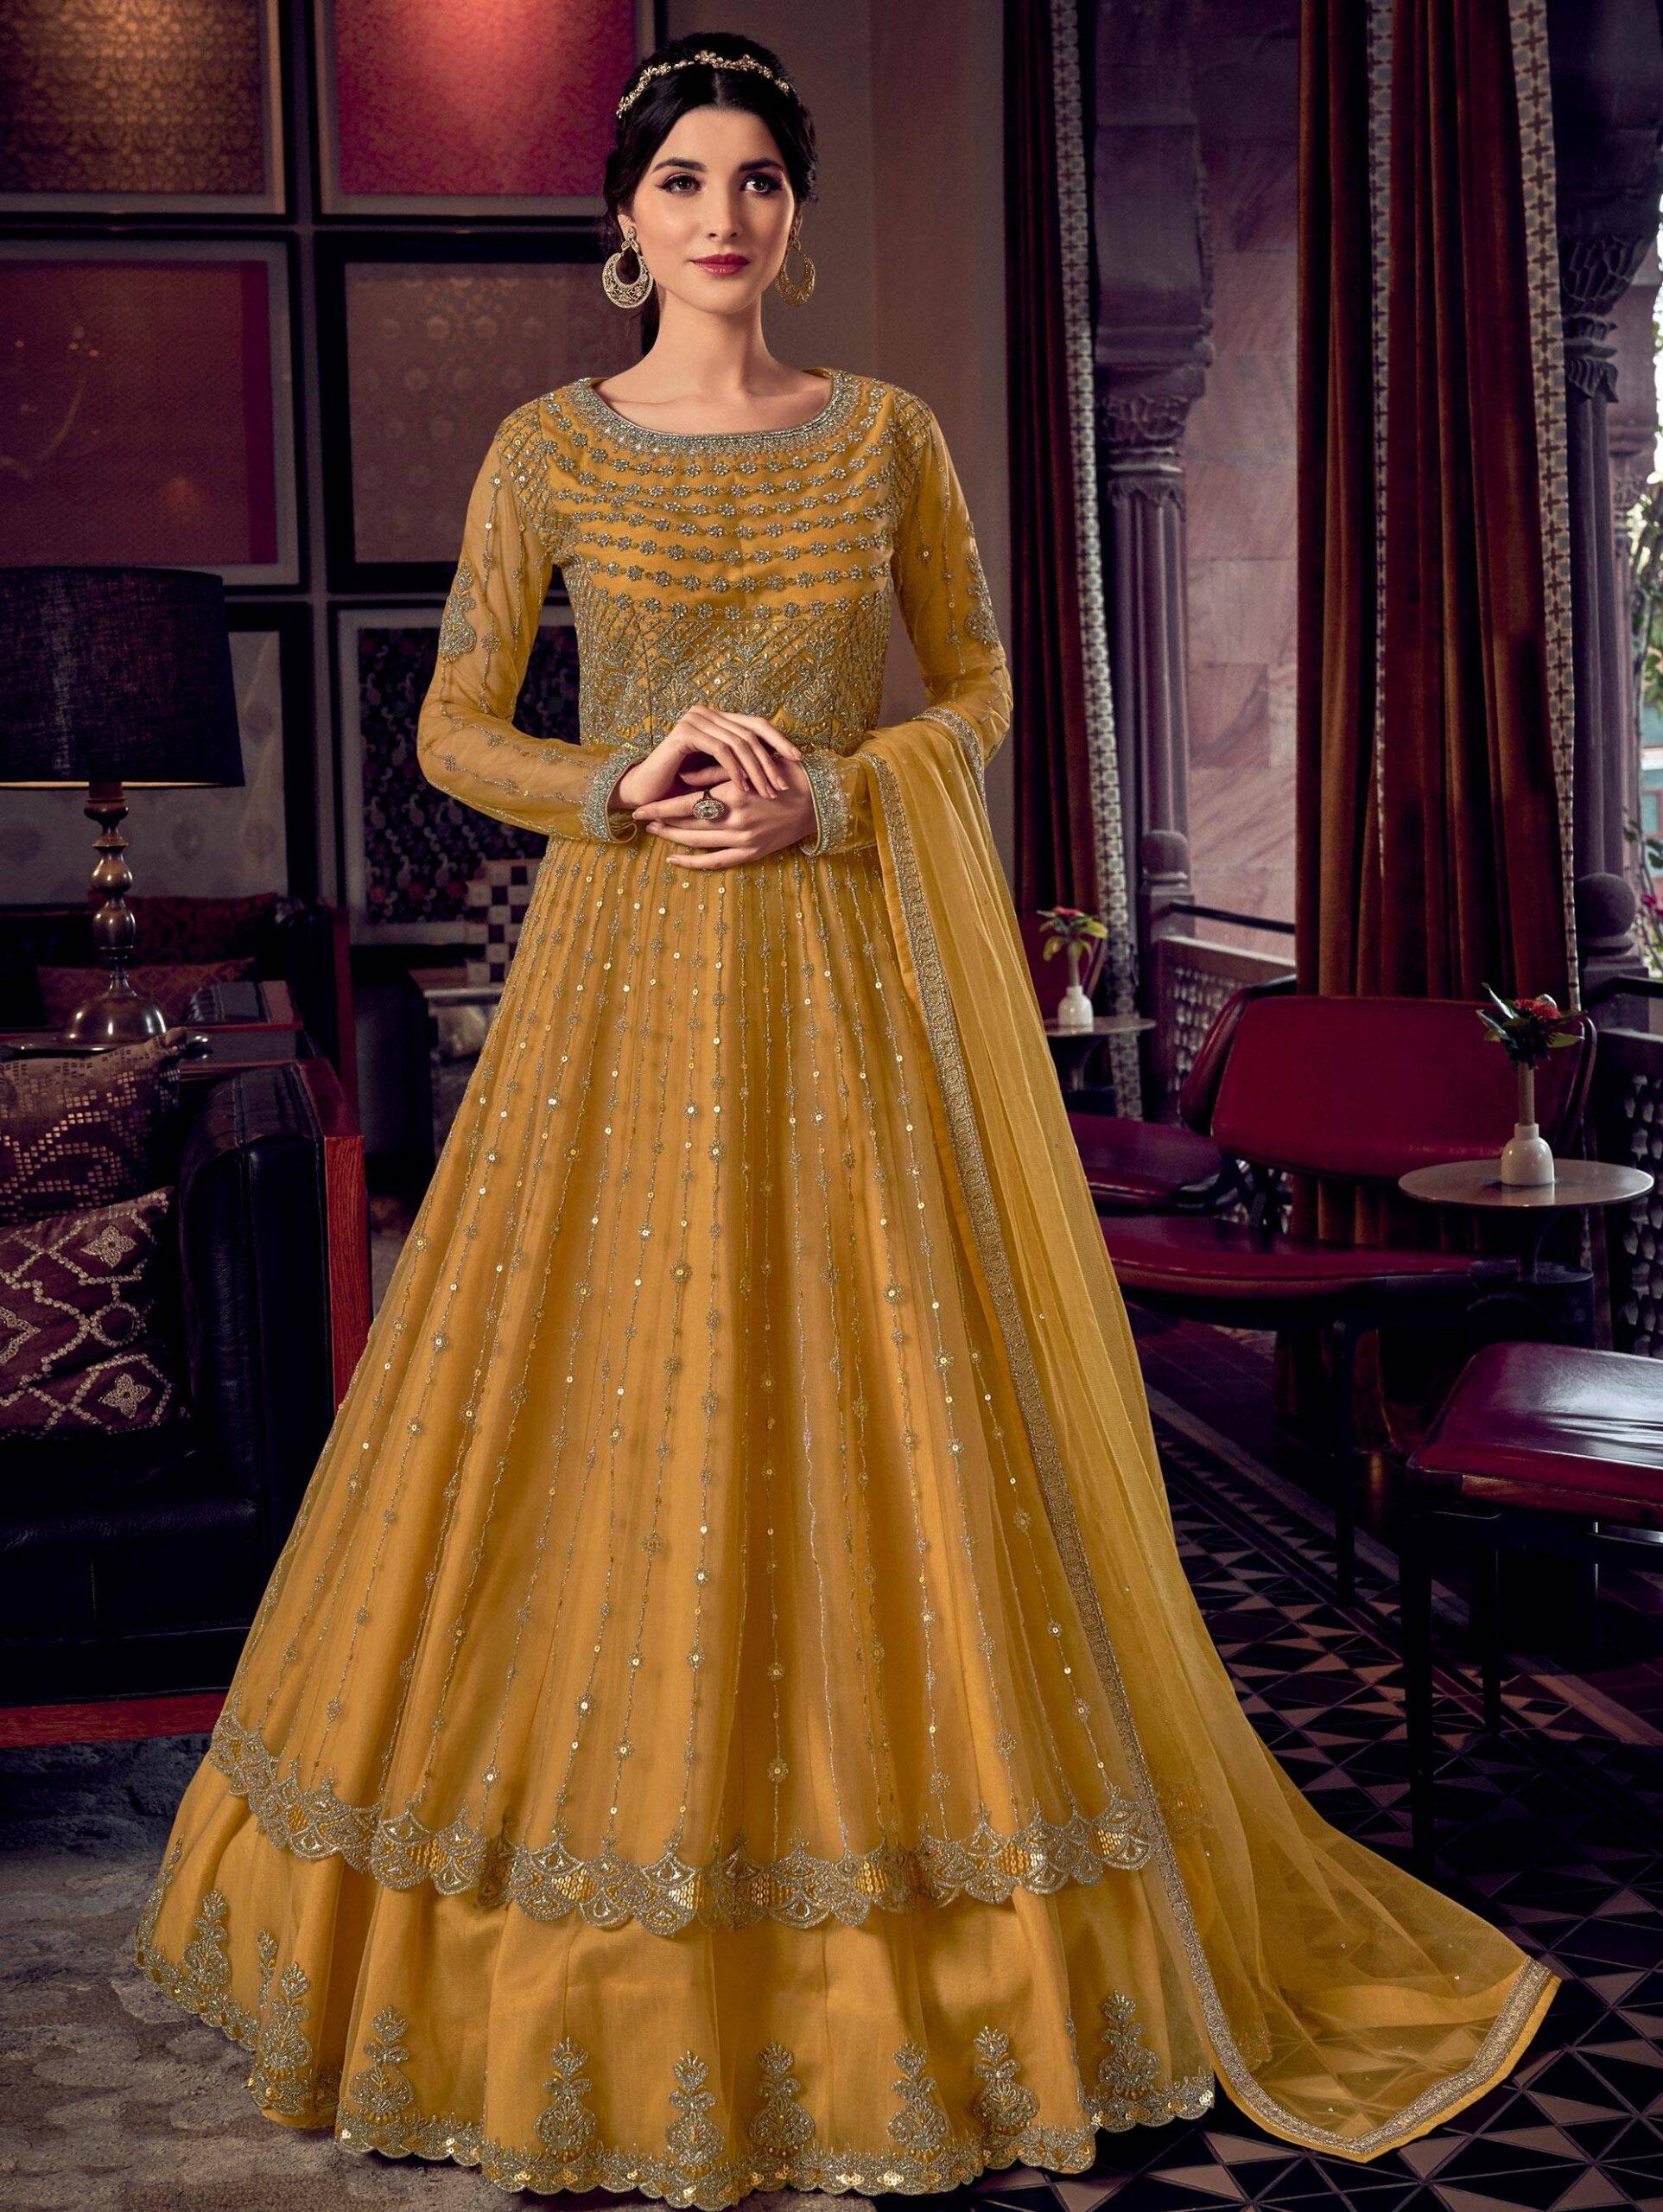 Yellow Colour Haldi Ceremony Dresses for Bride